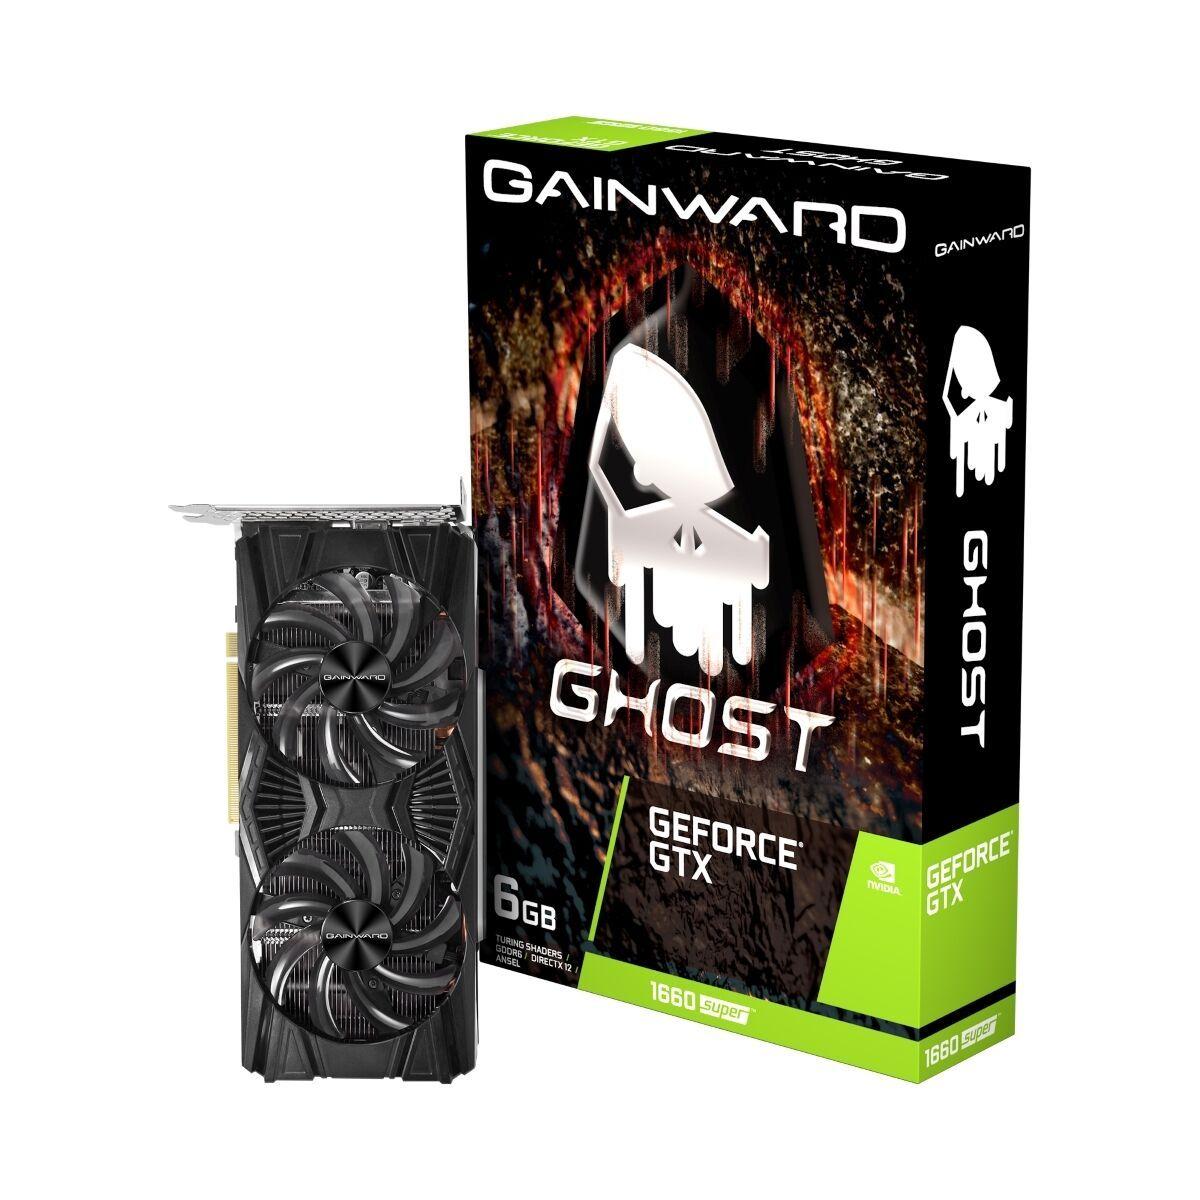 Gainward GeForce GTX 1660 SUPER Ghost6GB GDDR6 Grafikkarte - DisplayPort/HDMI/DVI [NBB]